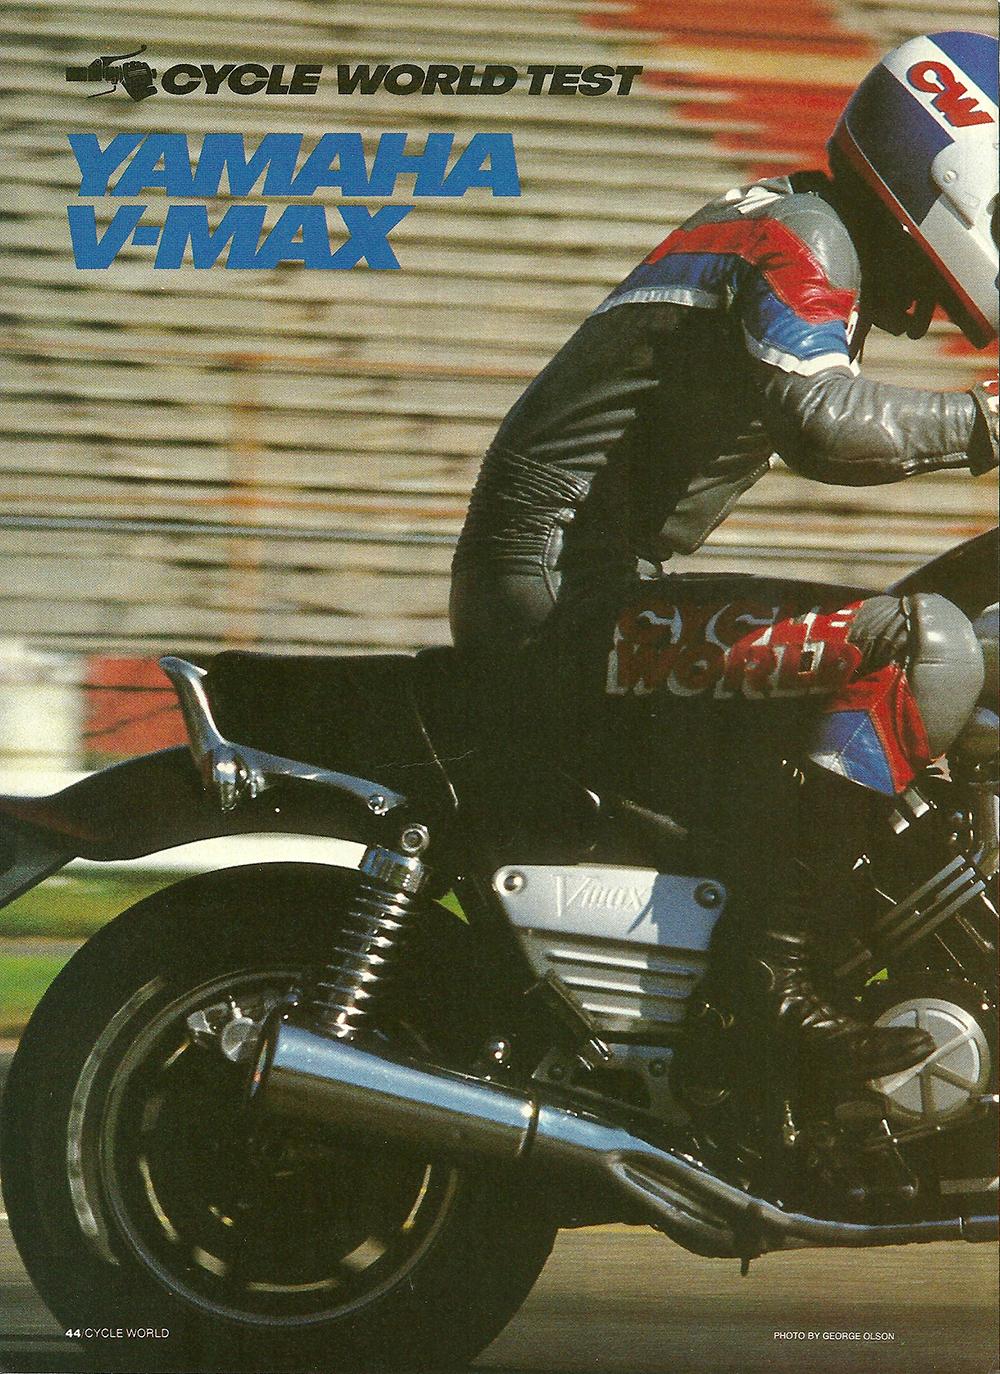 1985 Yamama Vmax 1200 road test 01.jpg